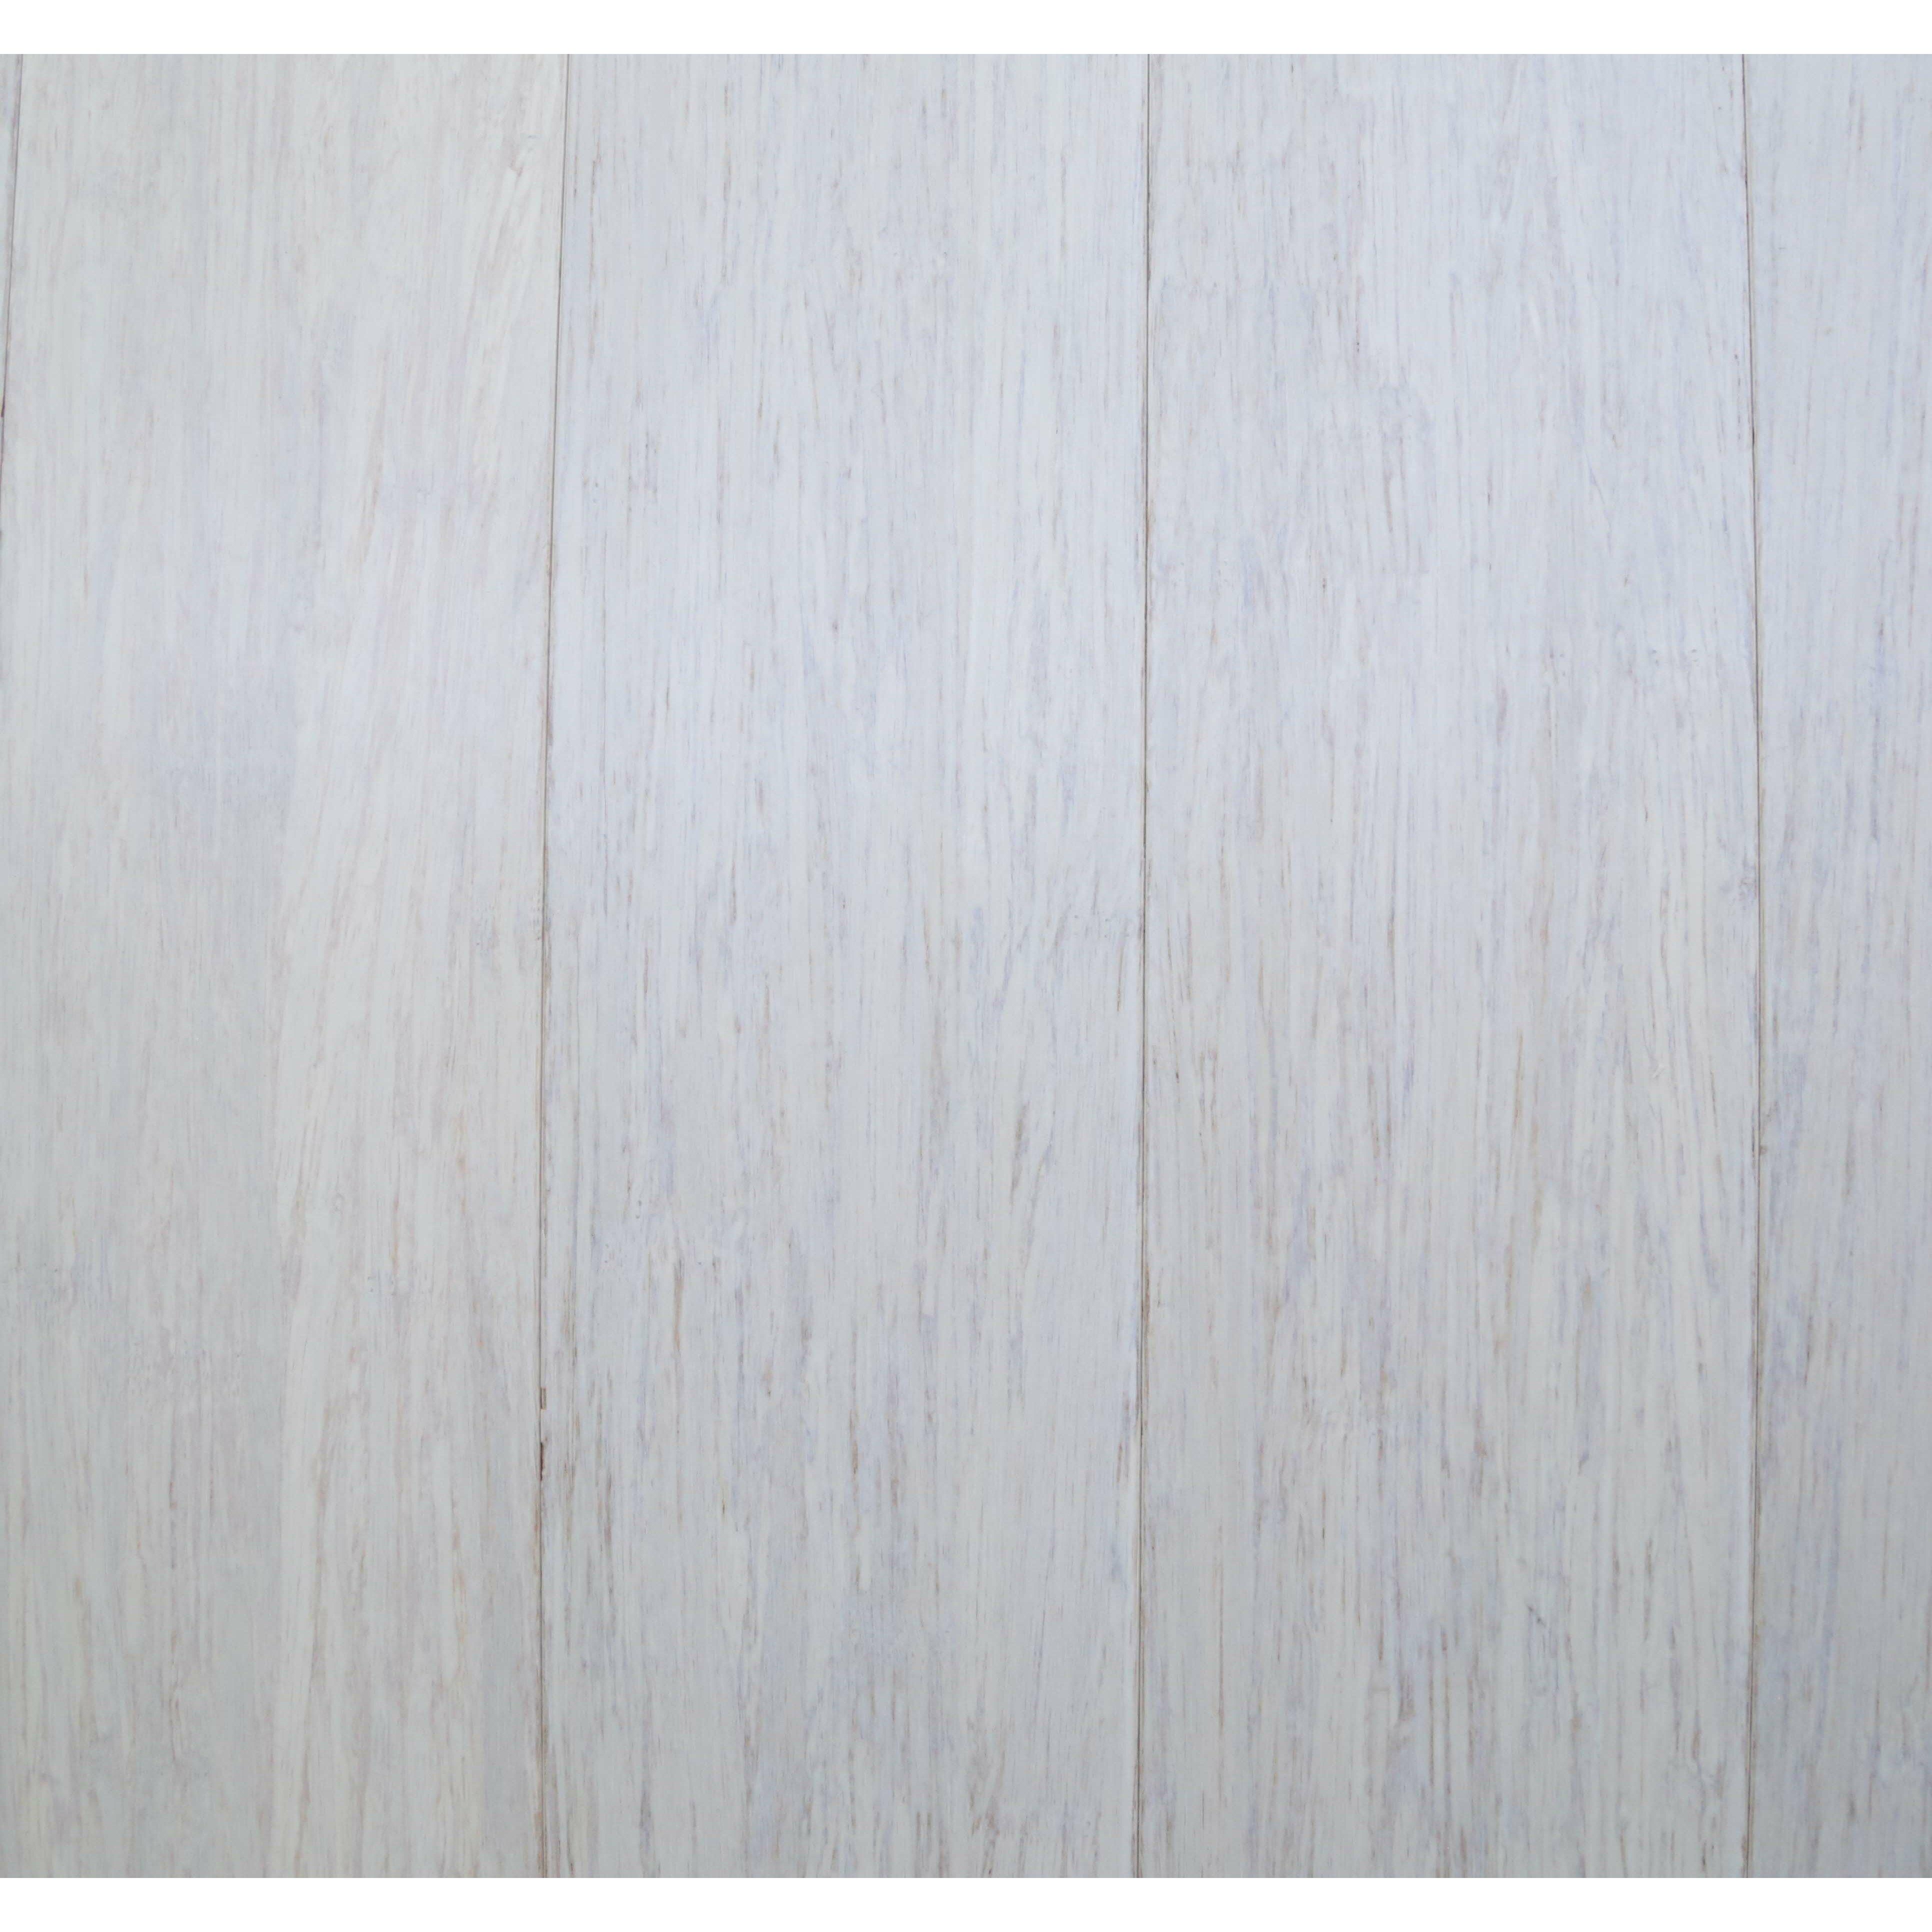 Silver Strand Bamboo Flooring